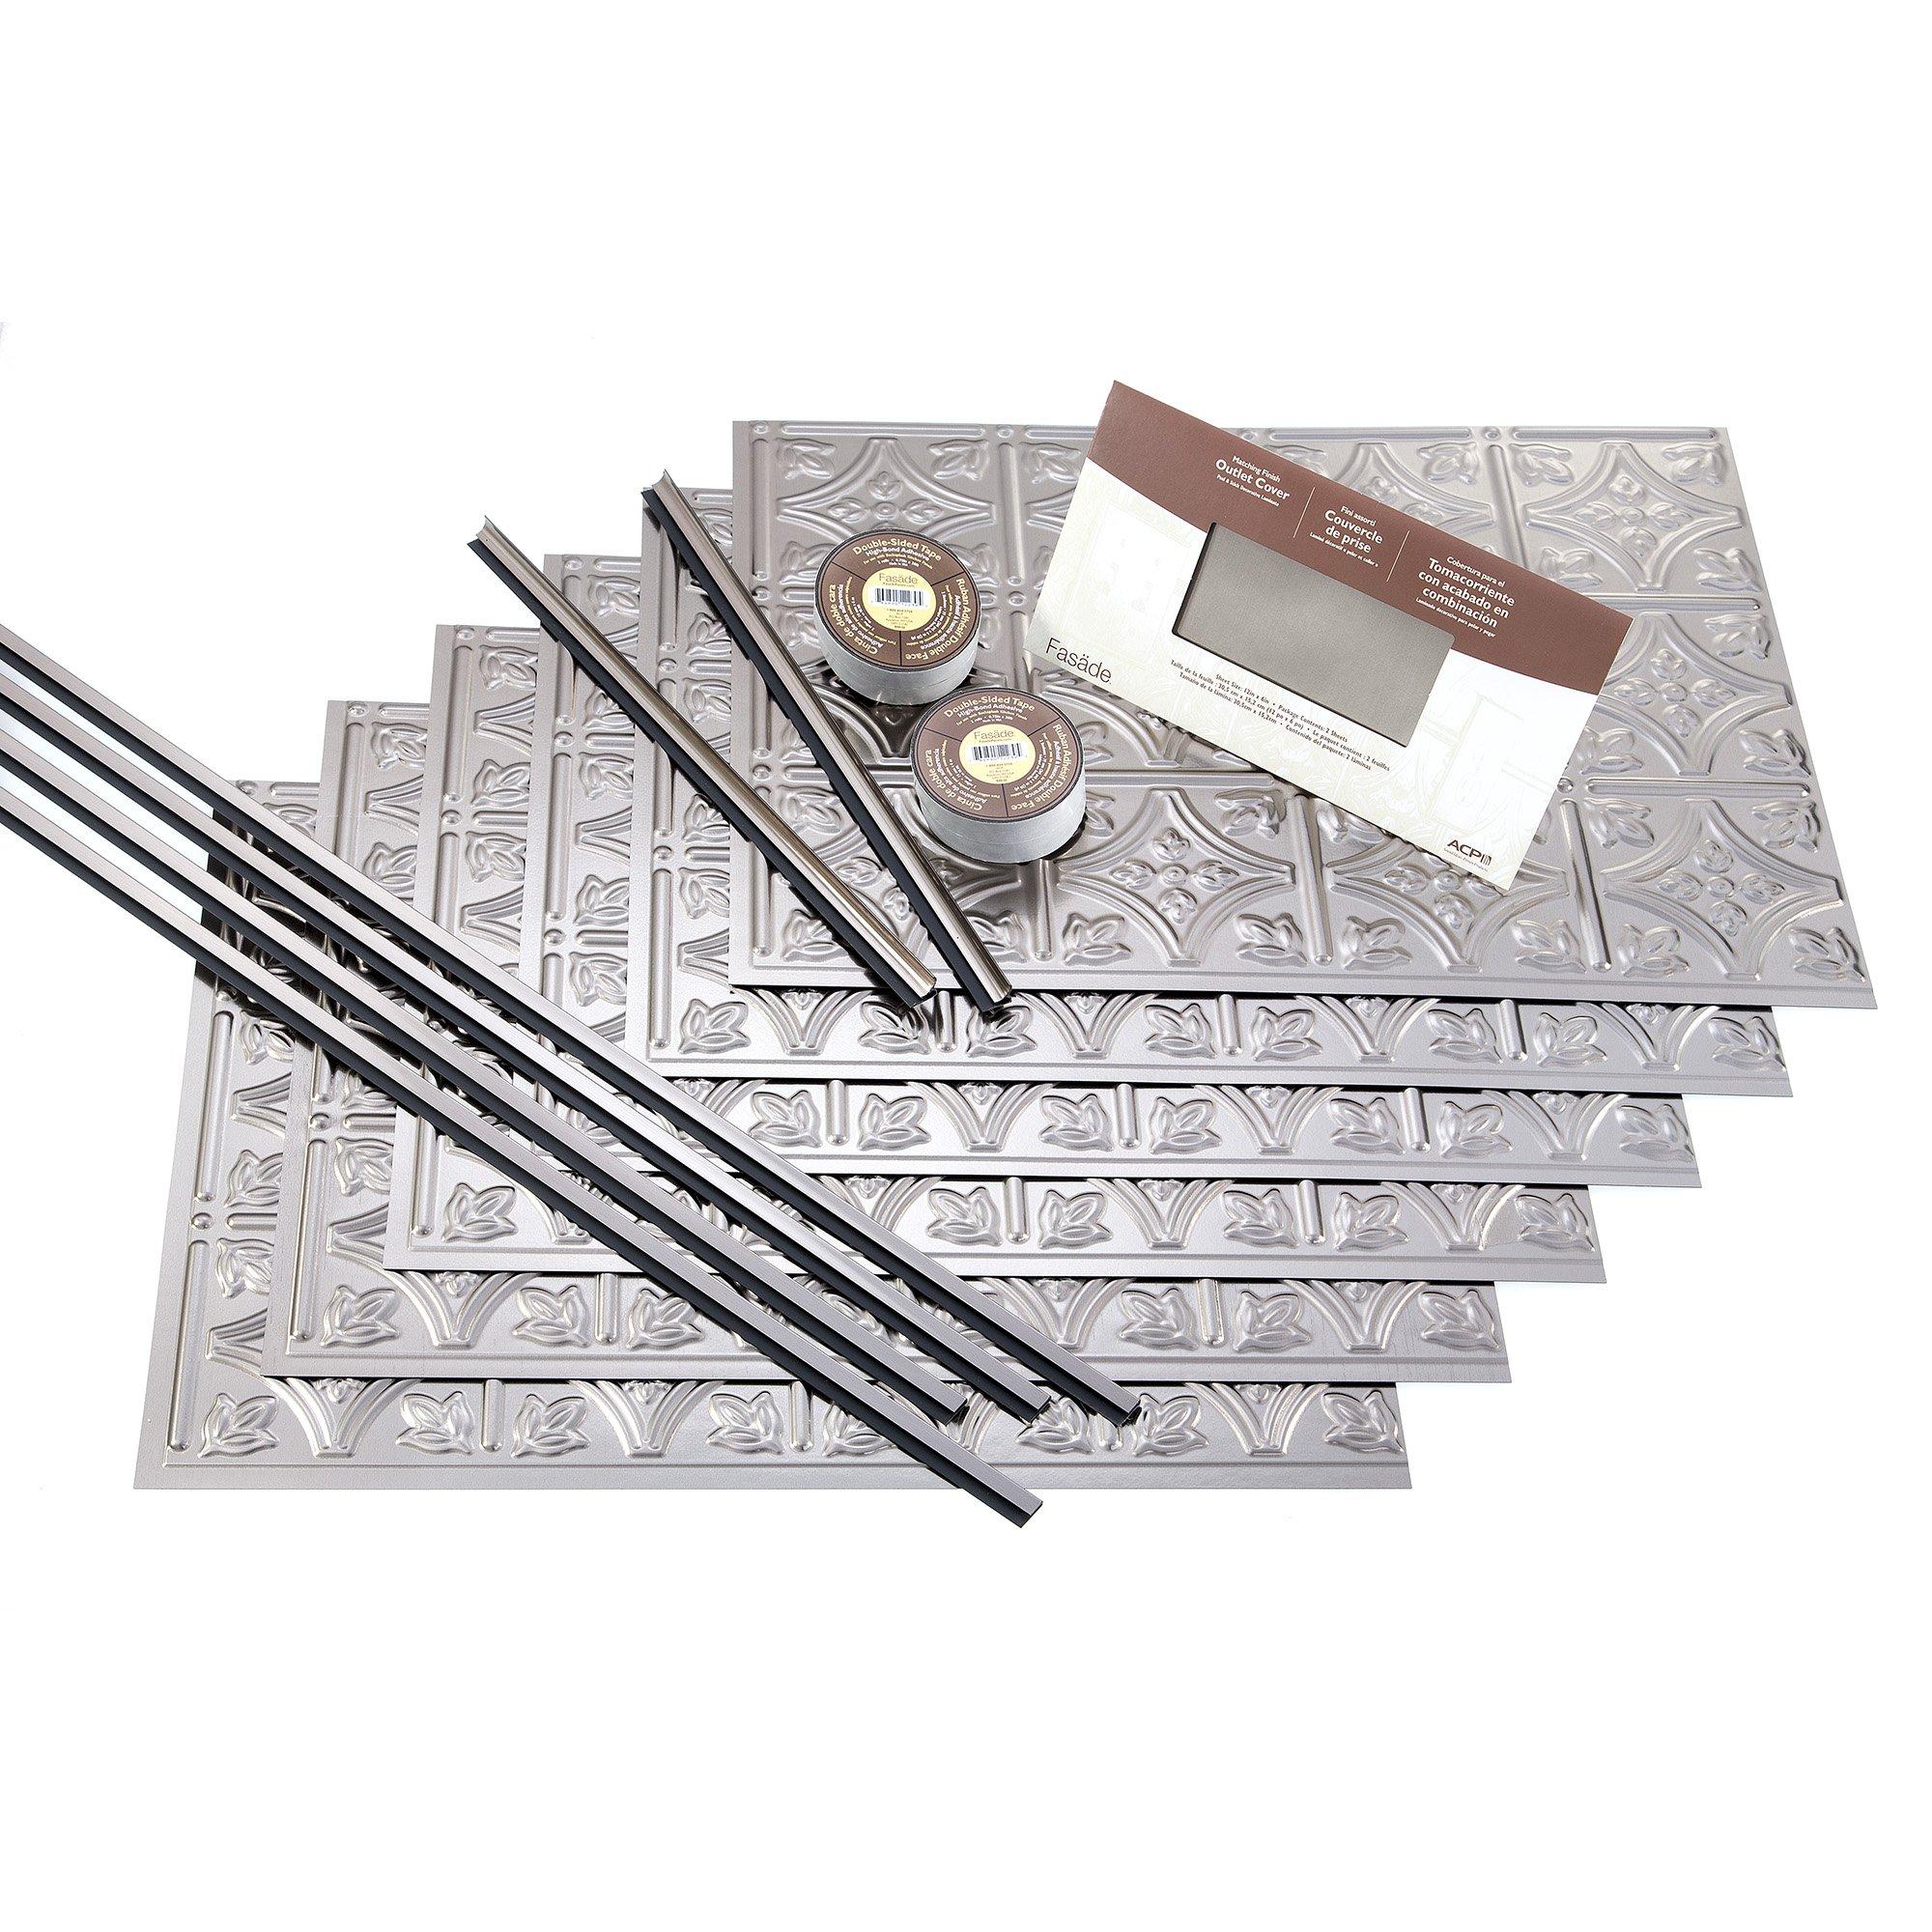 FASÄDE Easy Installation Traditional 1 Brushed Nickel Backsplash Panel for Kitchen and Bathrooms (18 sq ft Kit)